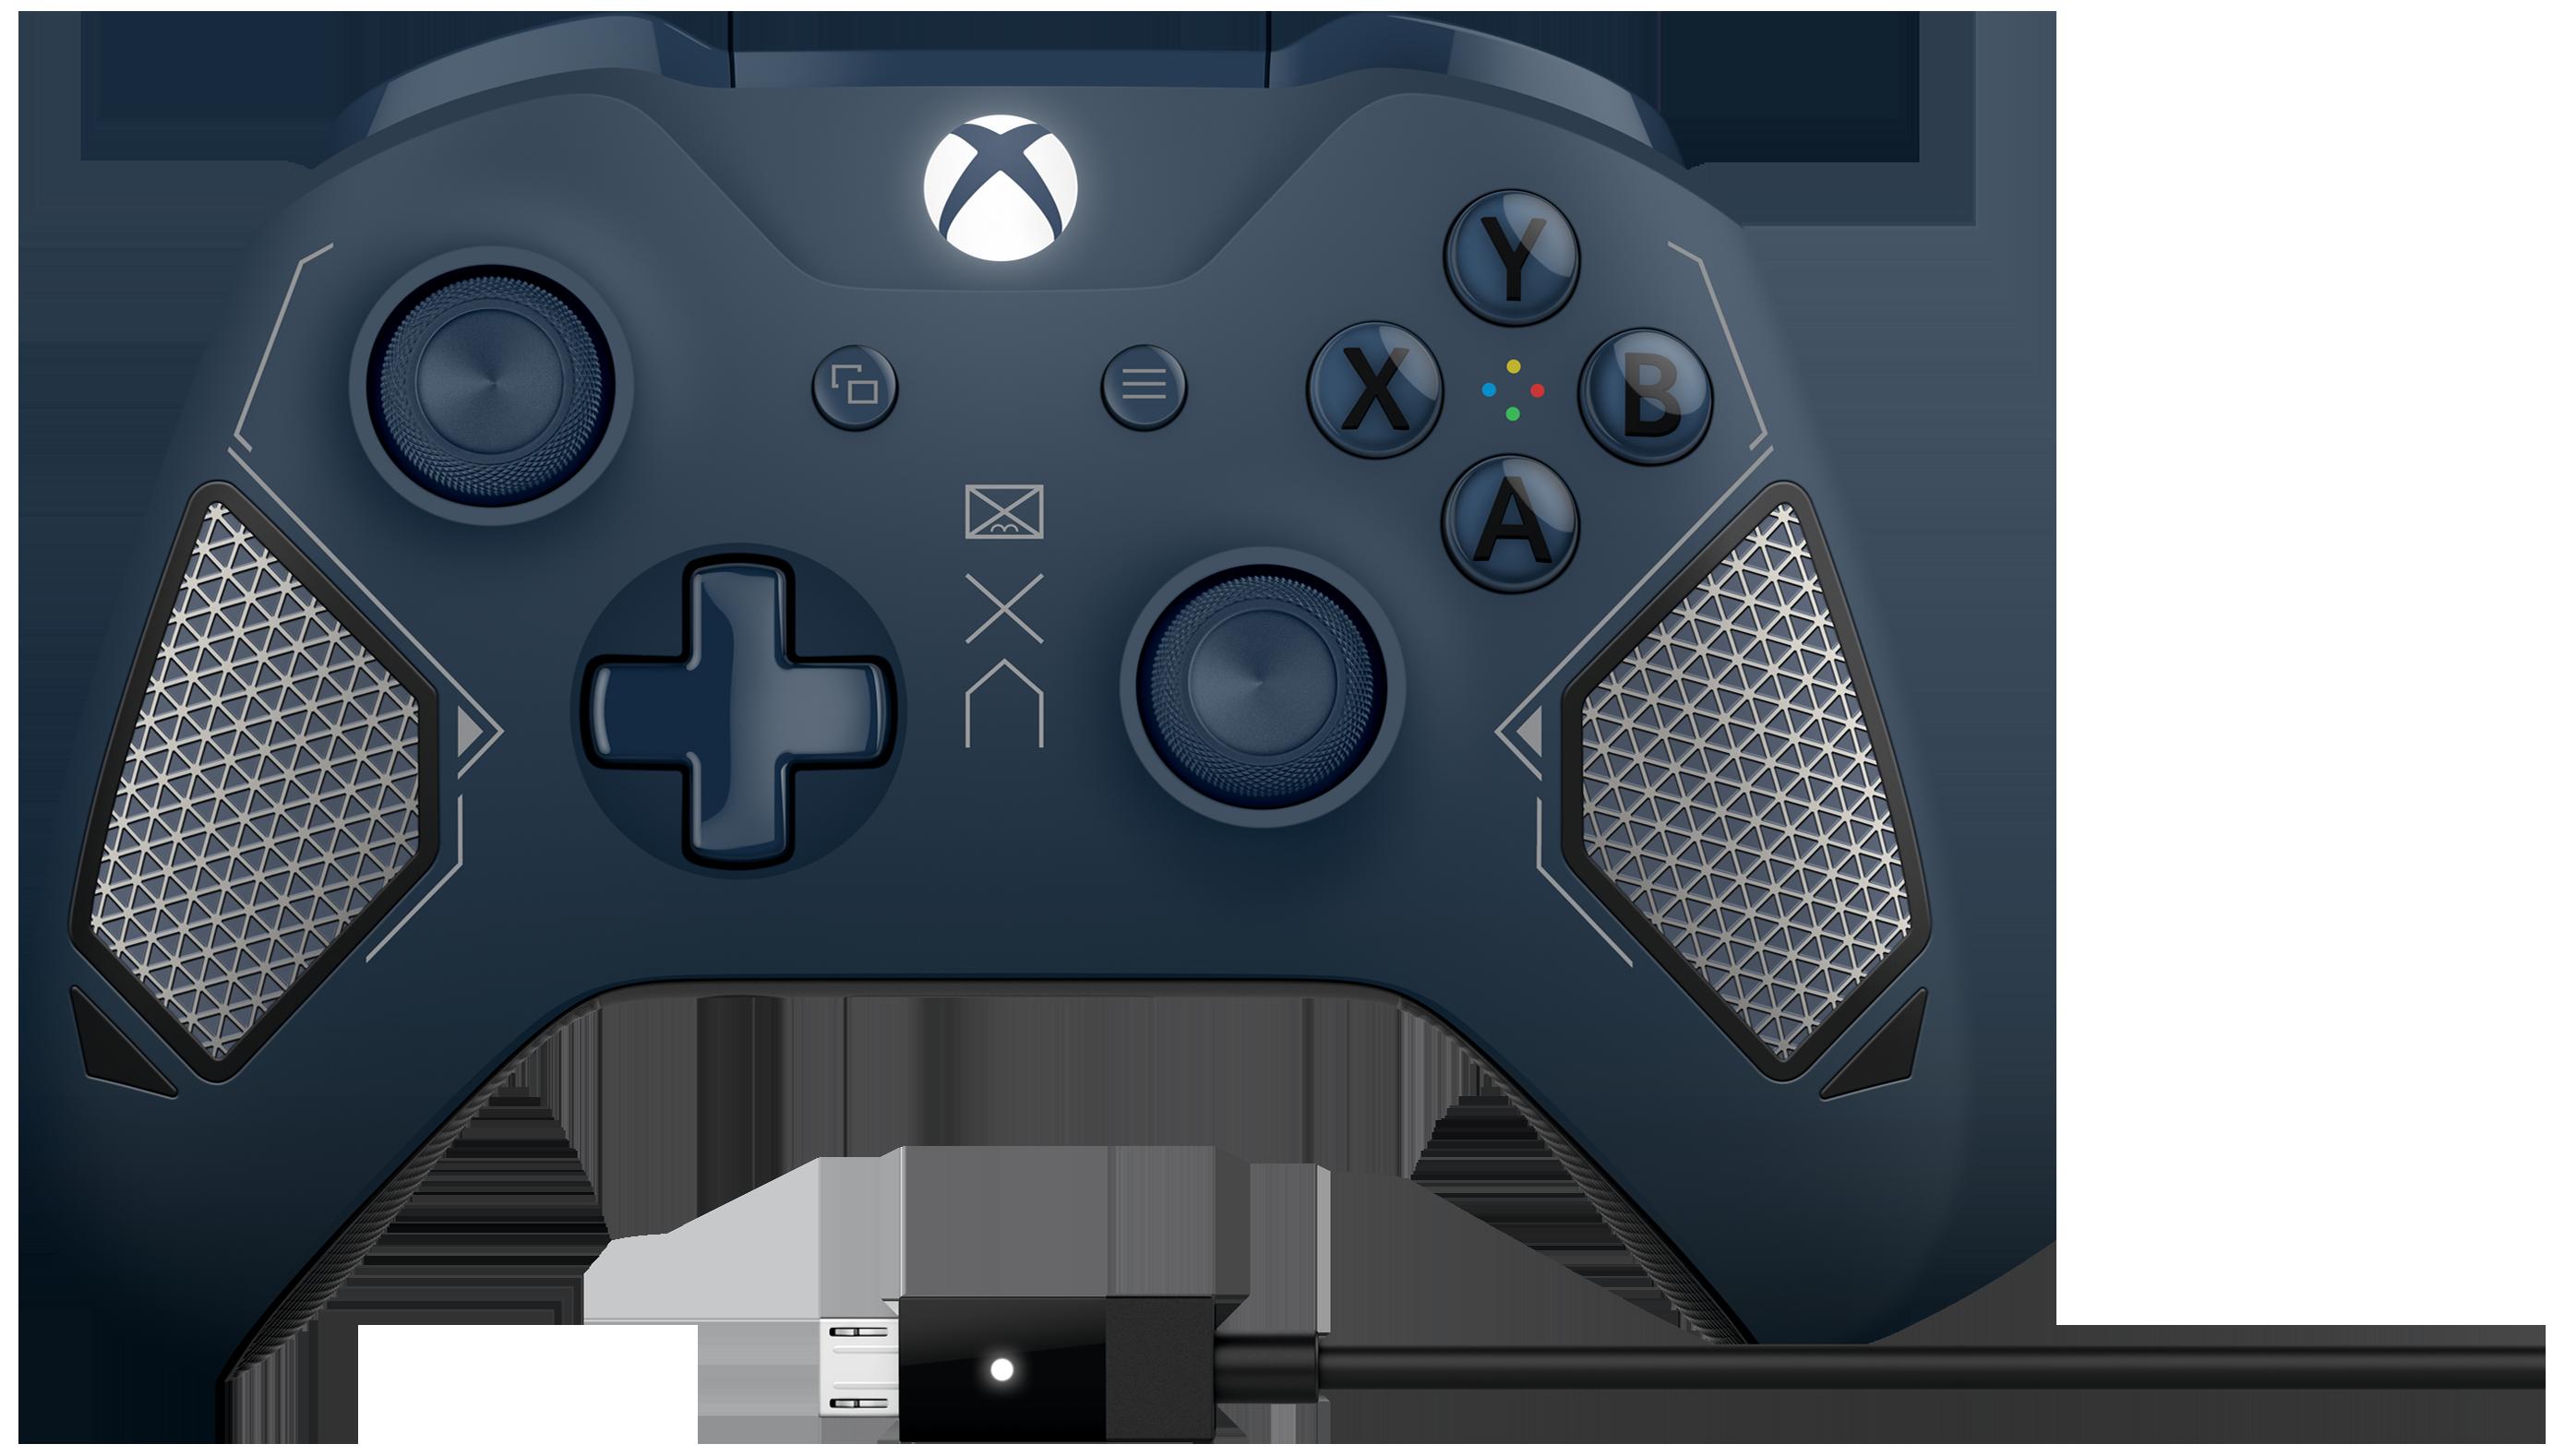 Xbox Patrol Tech Controller + Cable for Windows